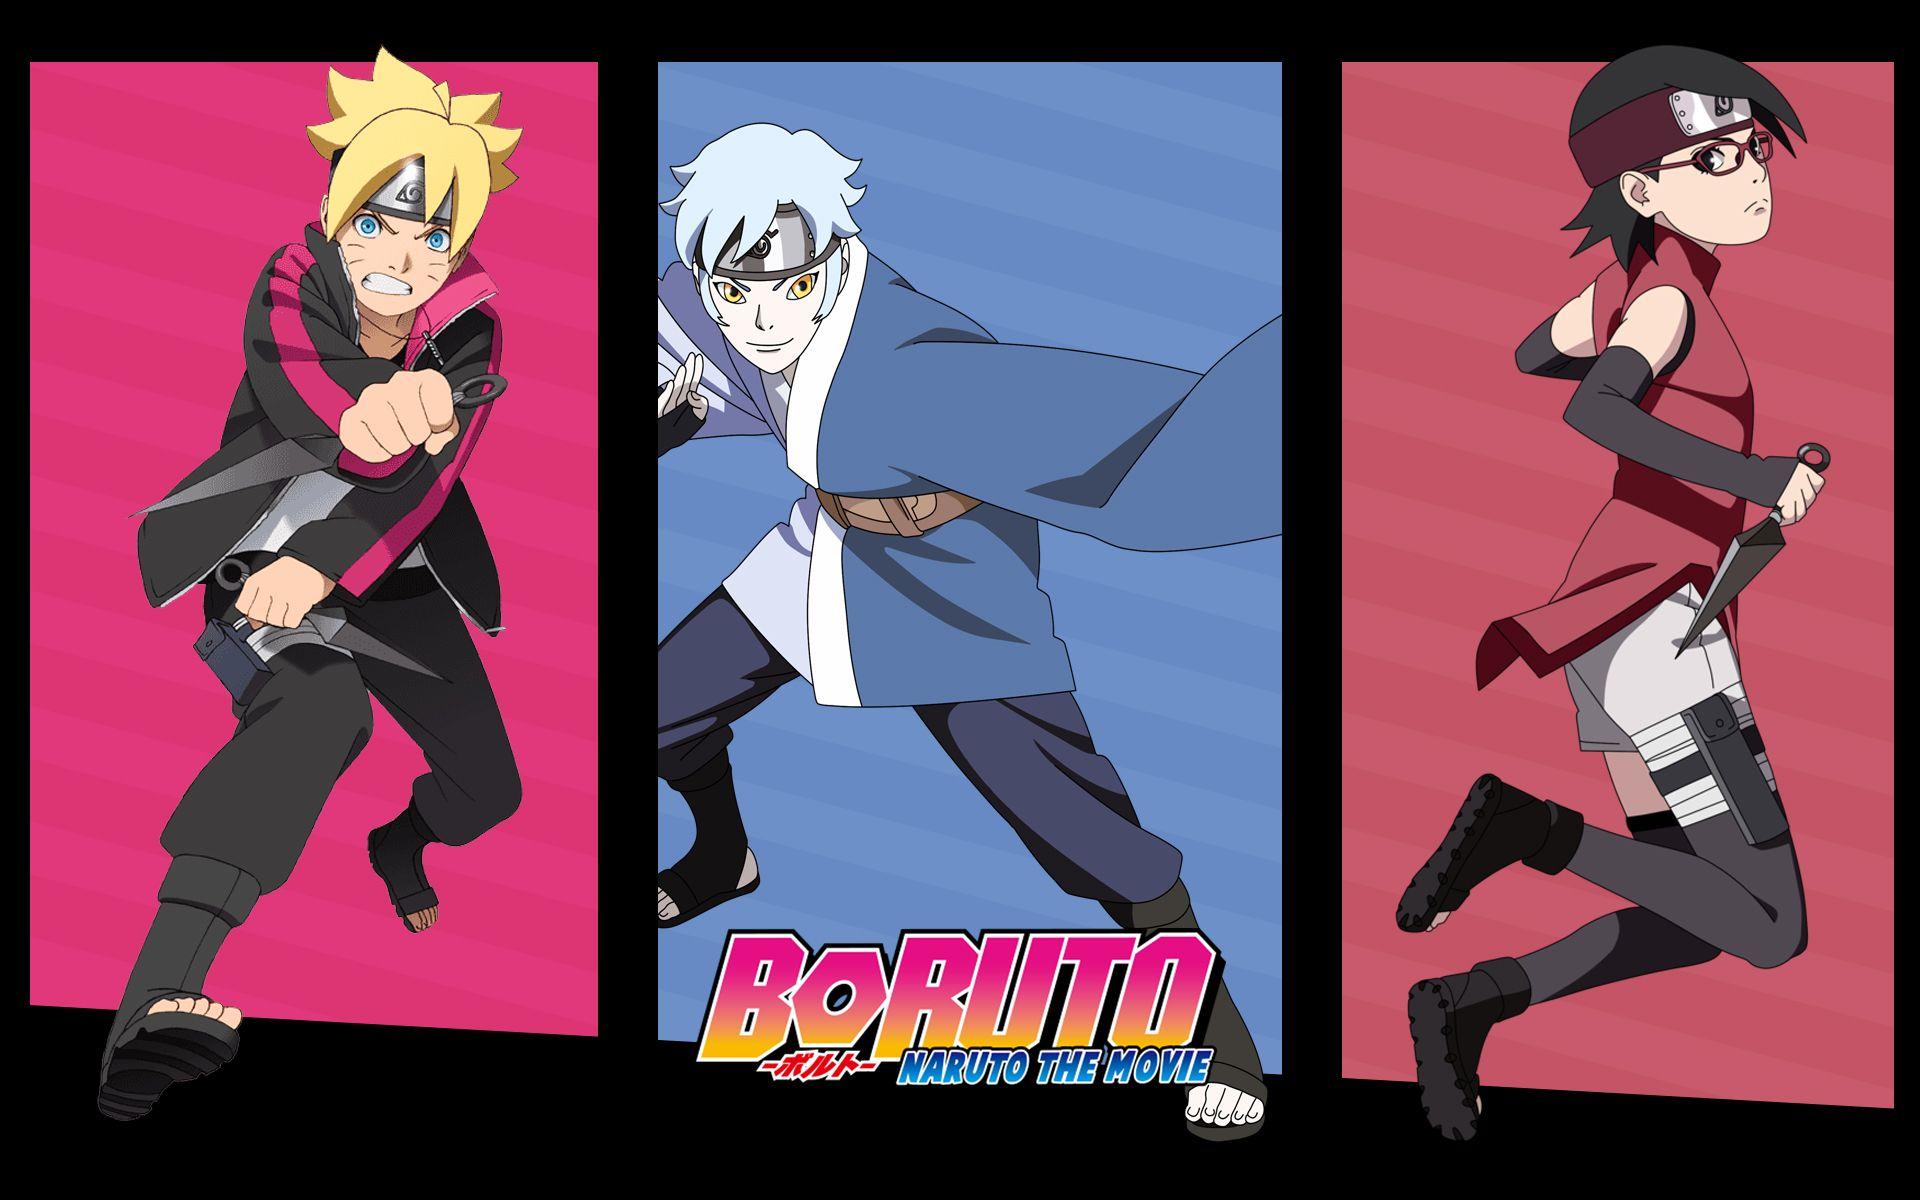 Pin By Deevan Roger On Naruto Shippuden Boruto Naruto The Movie Anime Boruto